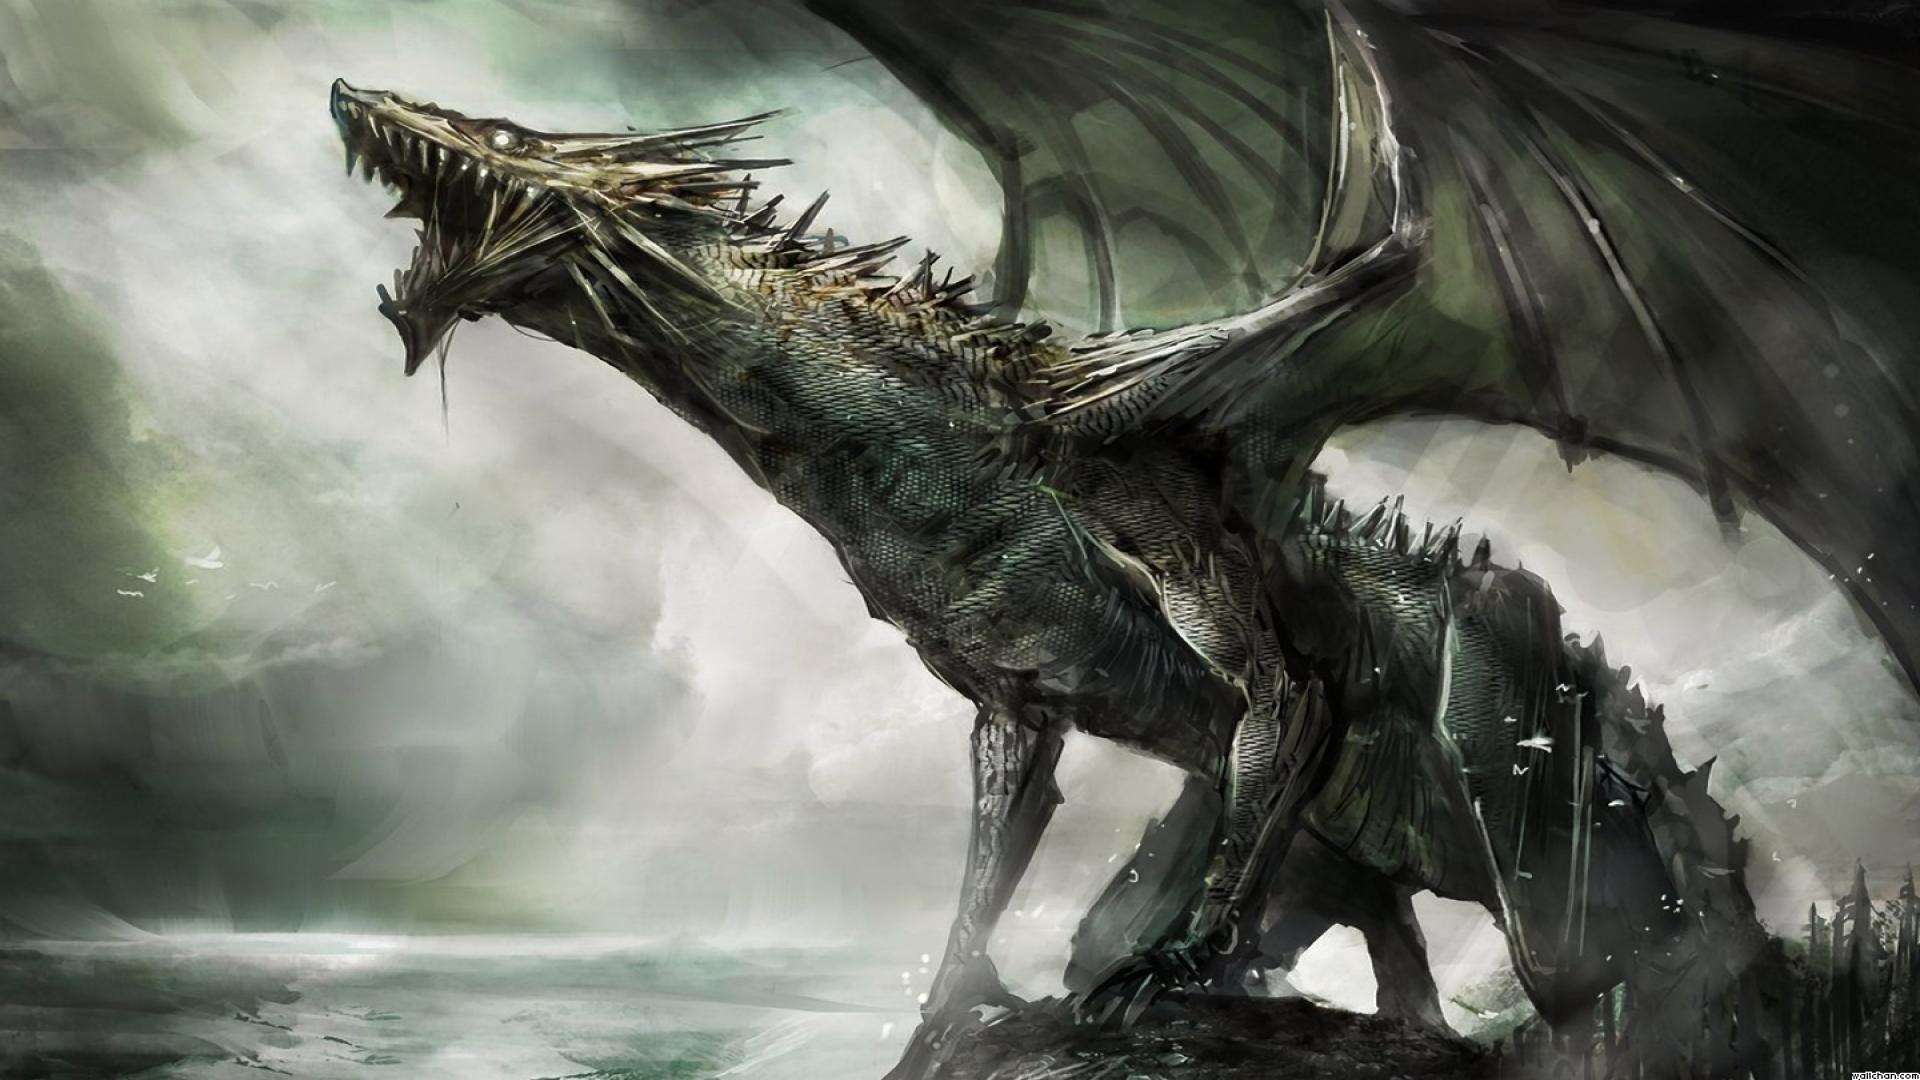 Fantasy Drachen Wallpaper | Drache | Pinterest | Drachen, Fantasy ...